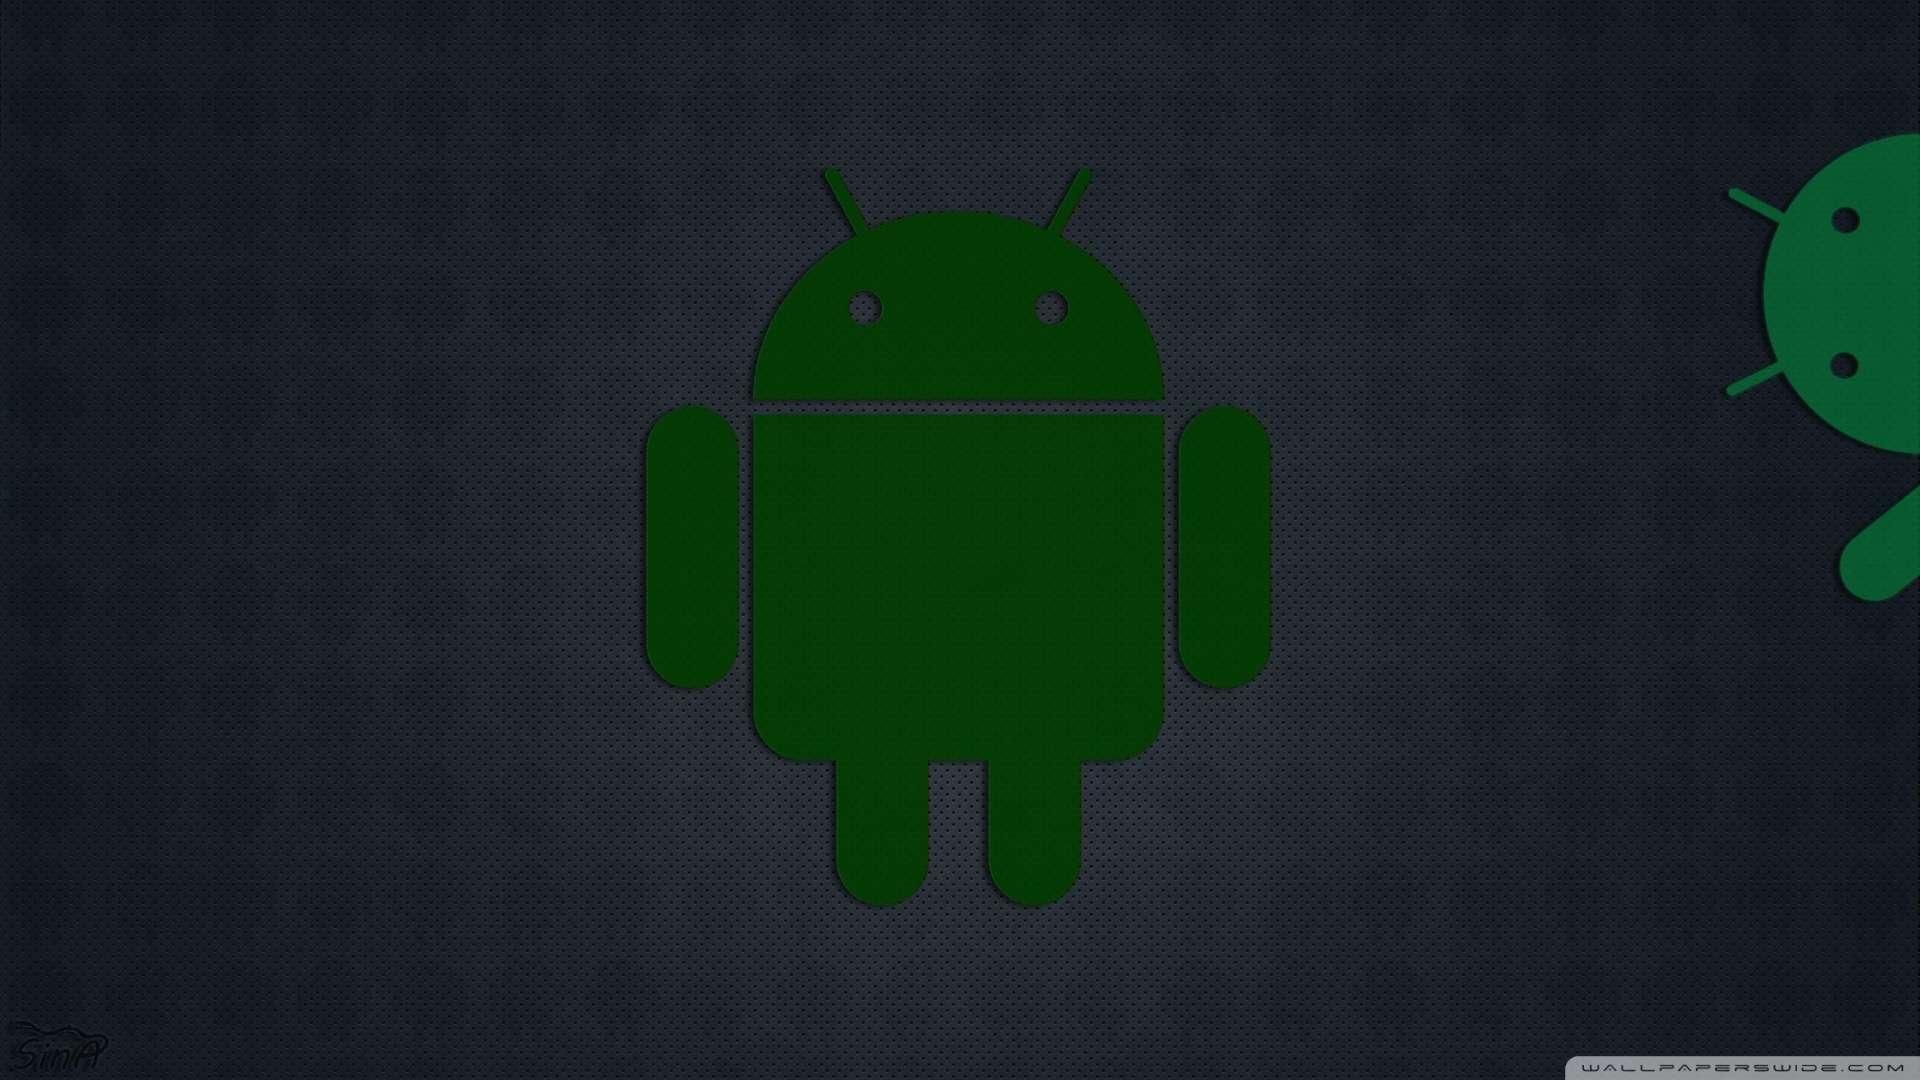 43+ Android 5.1 Wallpapers on WallpaperSafari